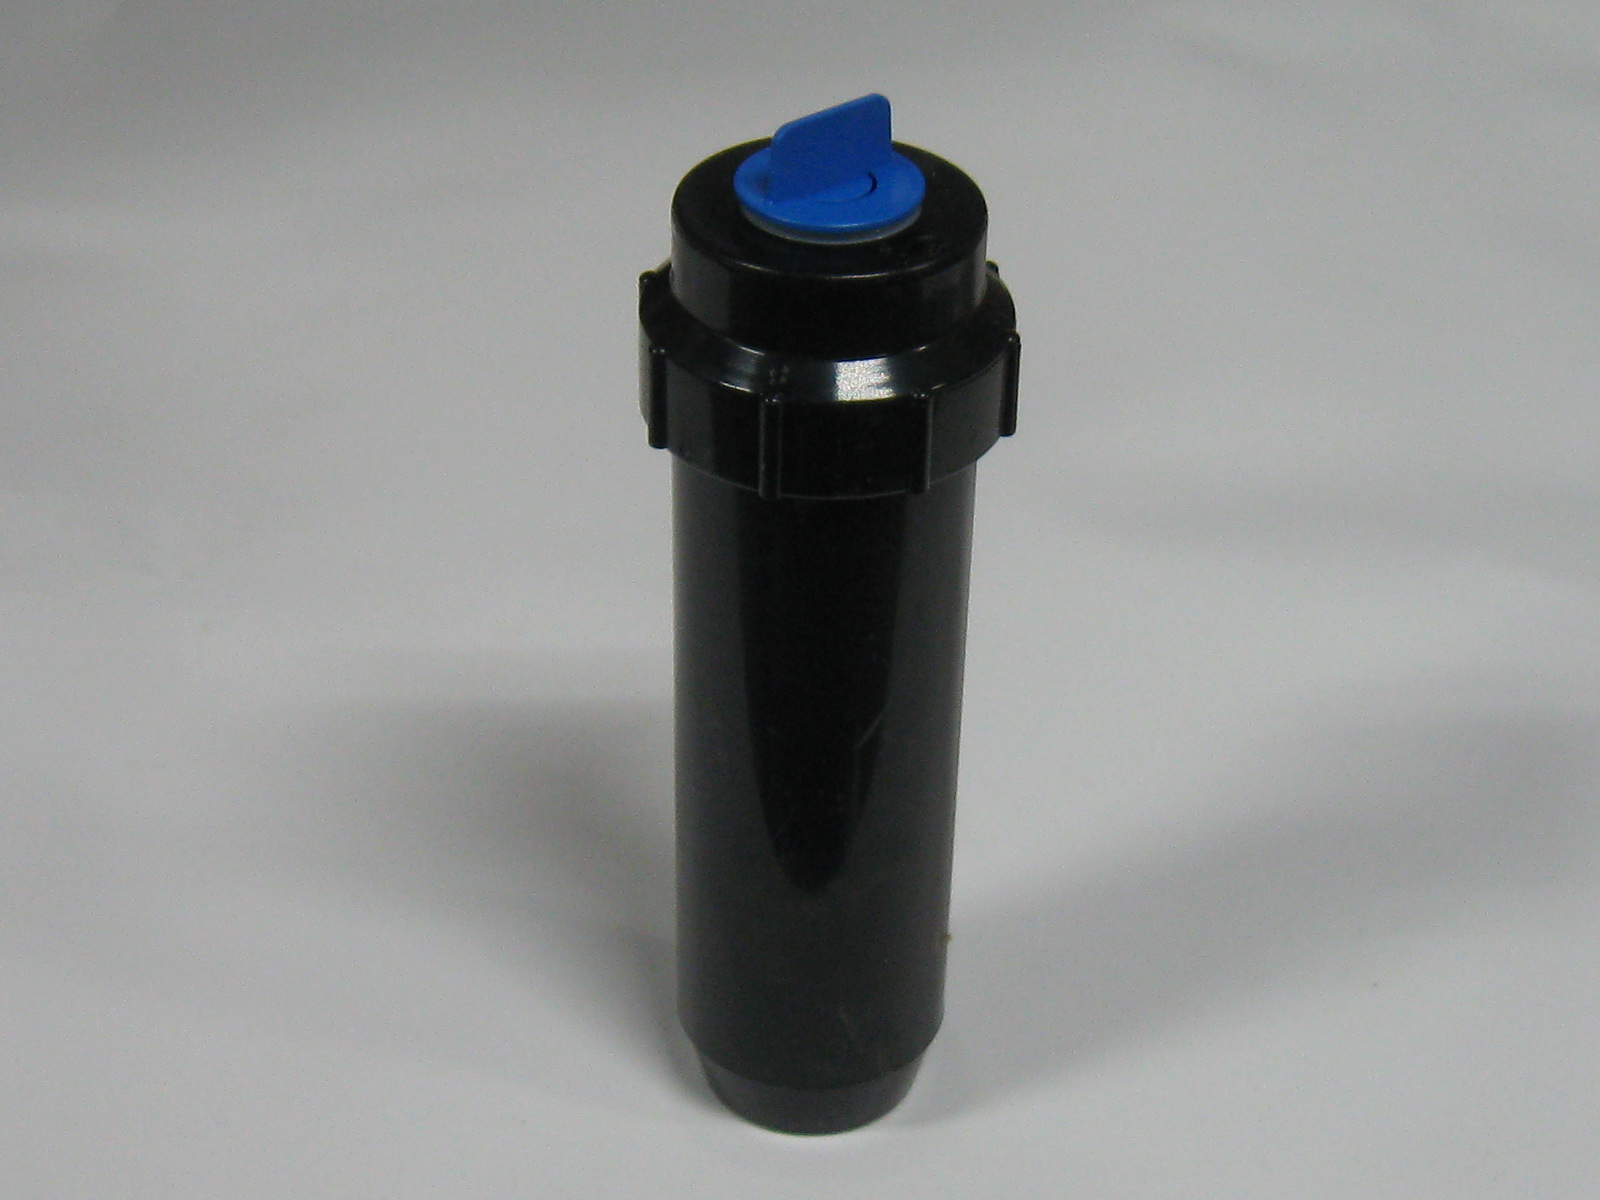 Mist Spray Heads : Irrigation supplies quot pop up spray mist head kpm